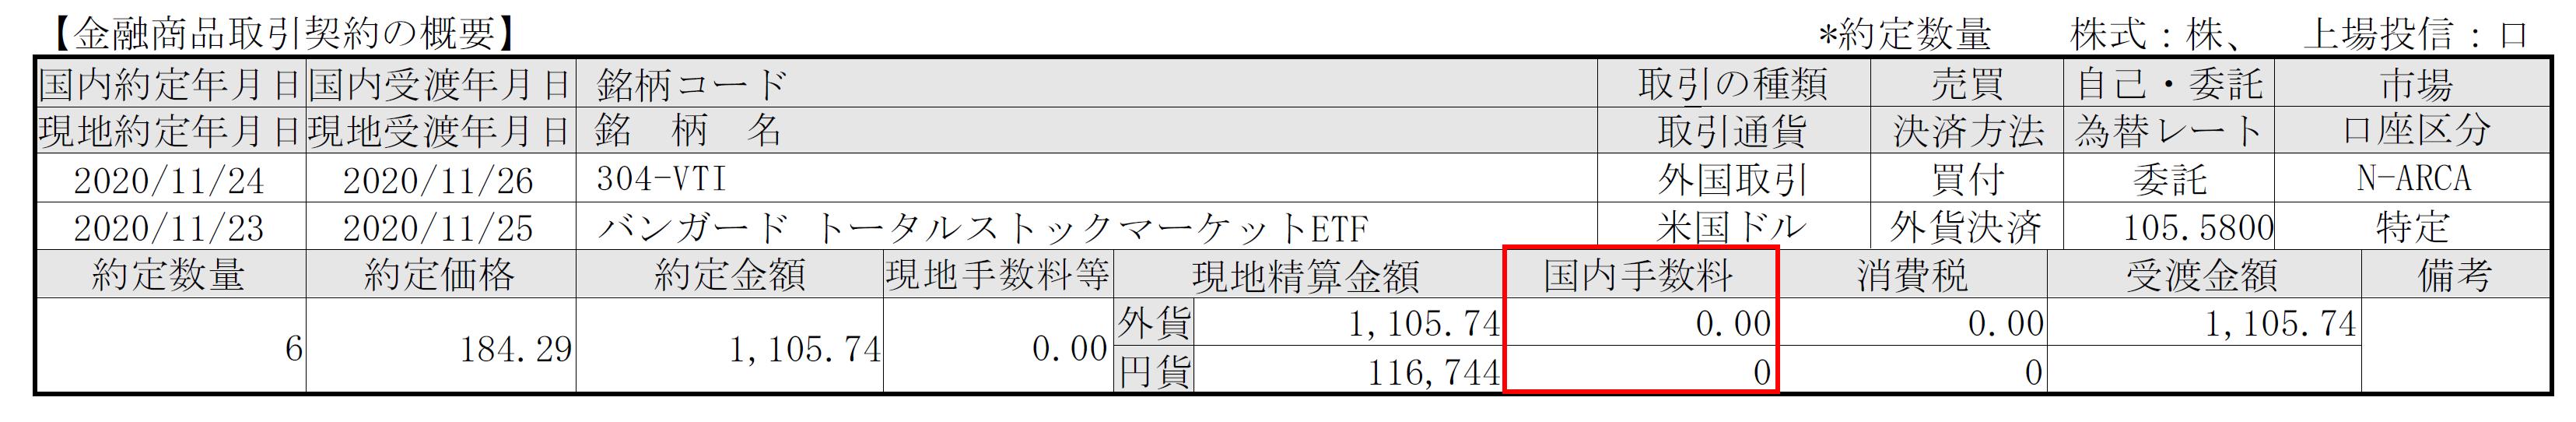 f:id:hodo-work:20201126112417p:plain